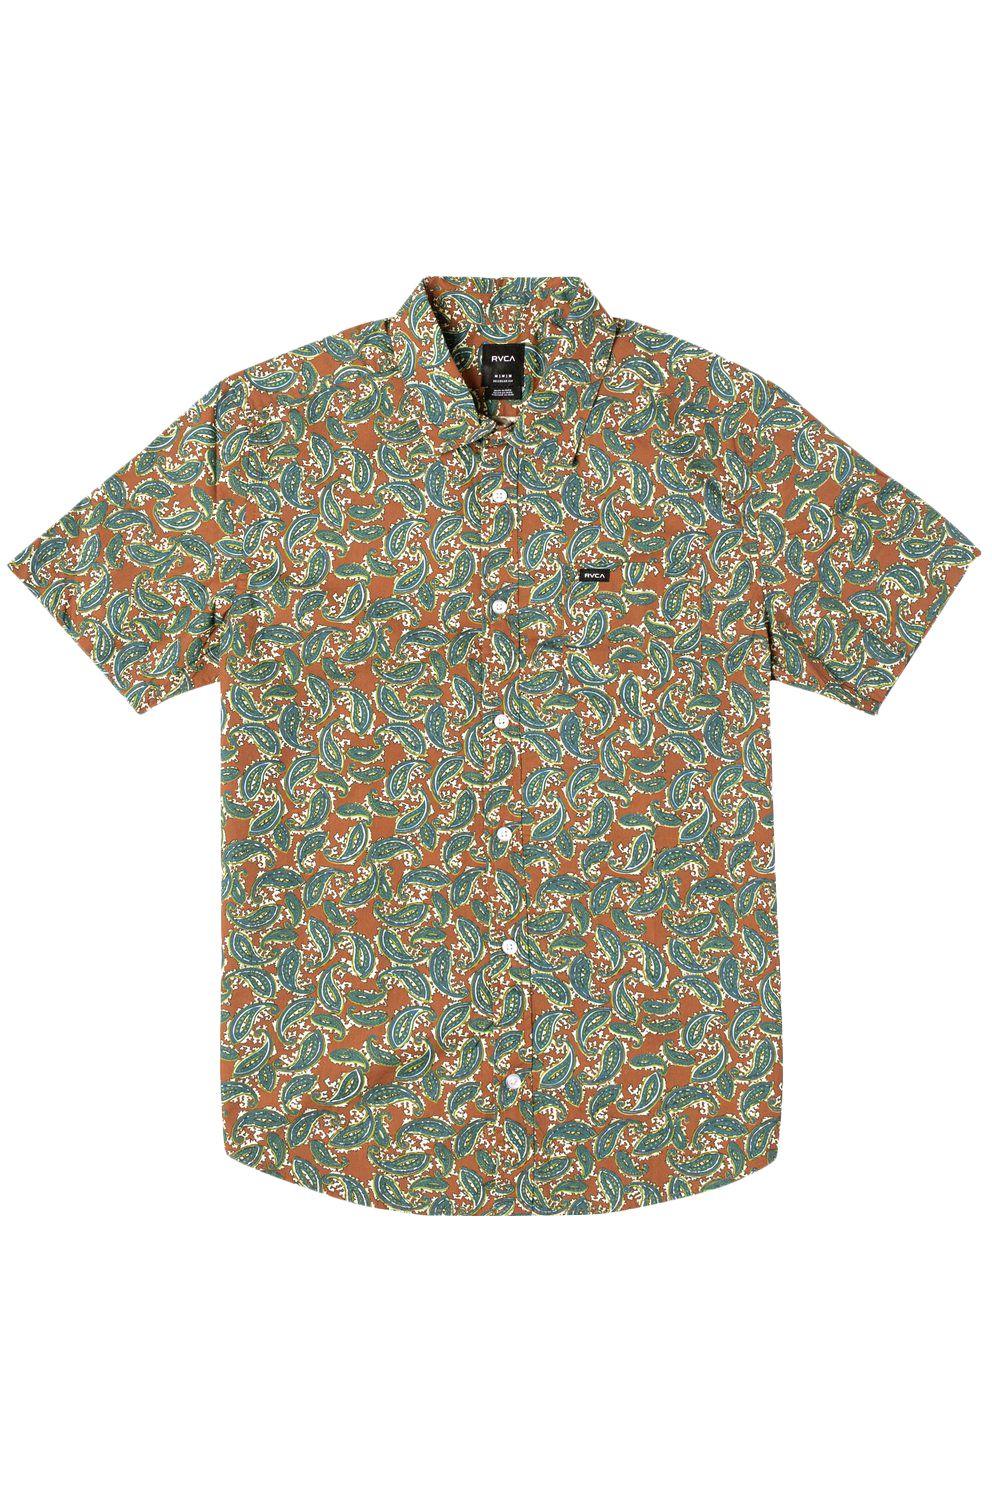 Camisa RVCA MIND FLOWER PAISLEY Clay